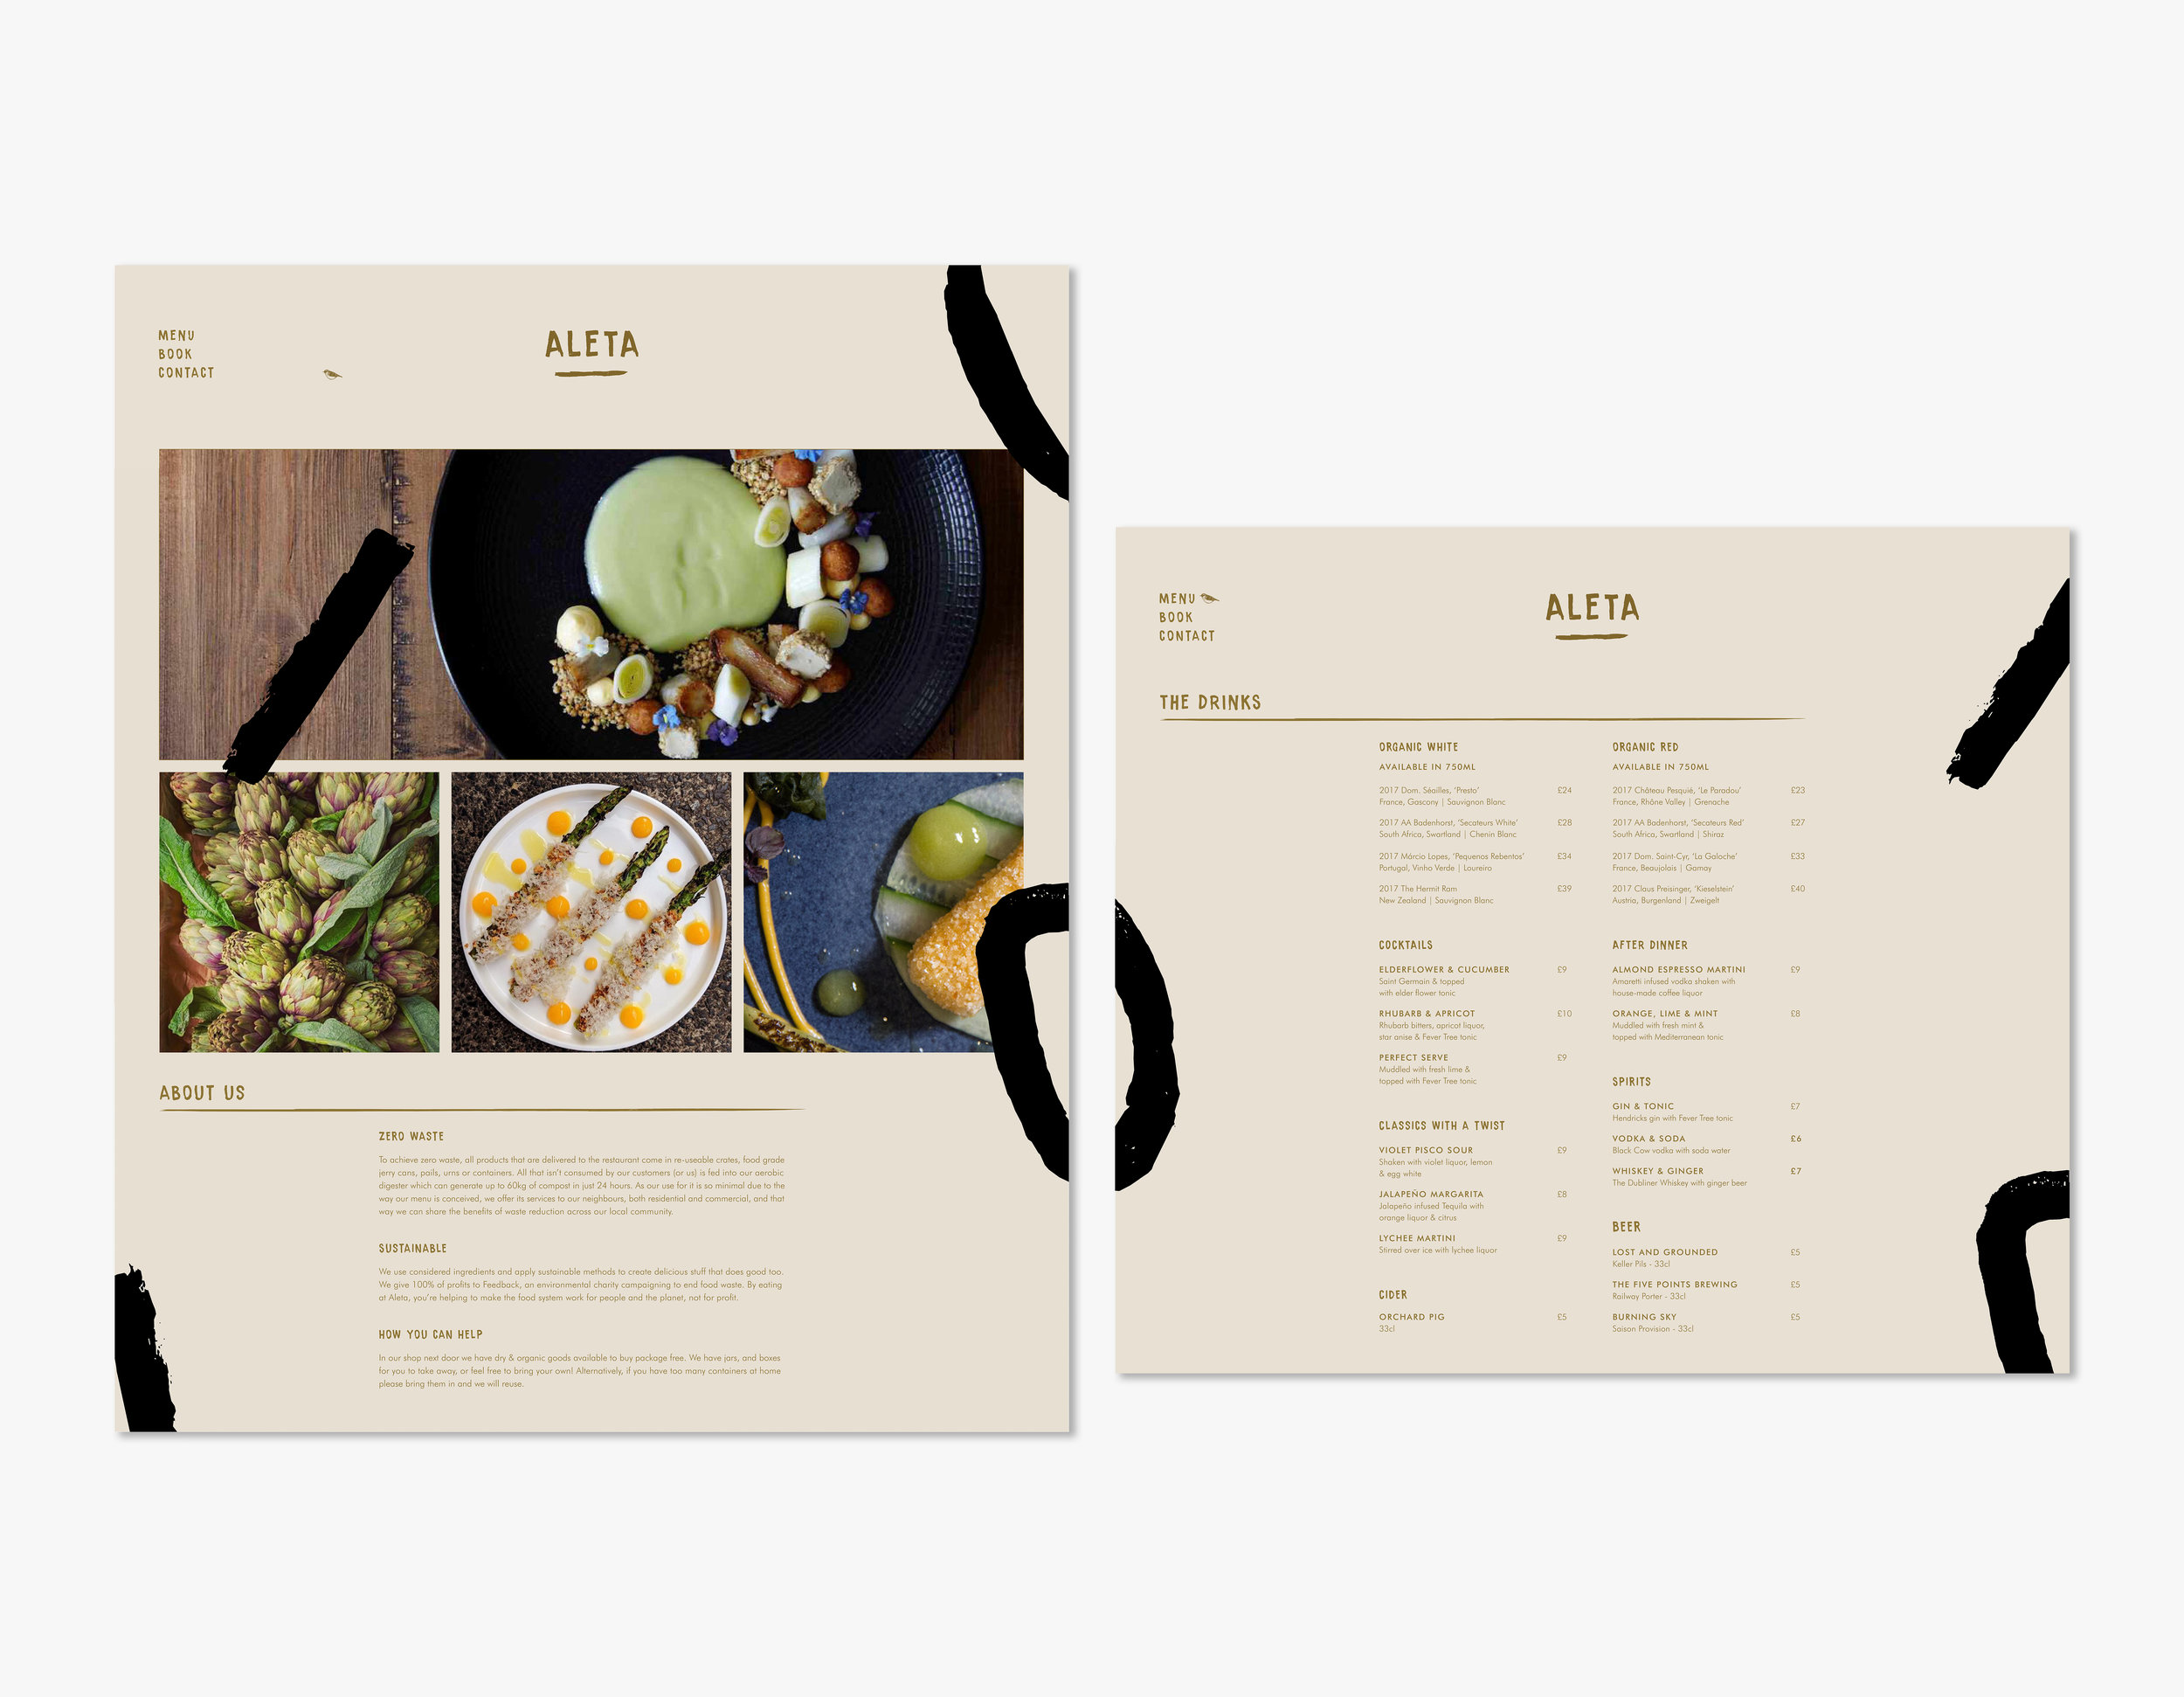 Aleta_Restaurant Branding_Website Scroll_x2.jpg